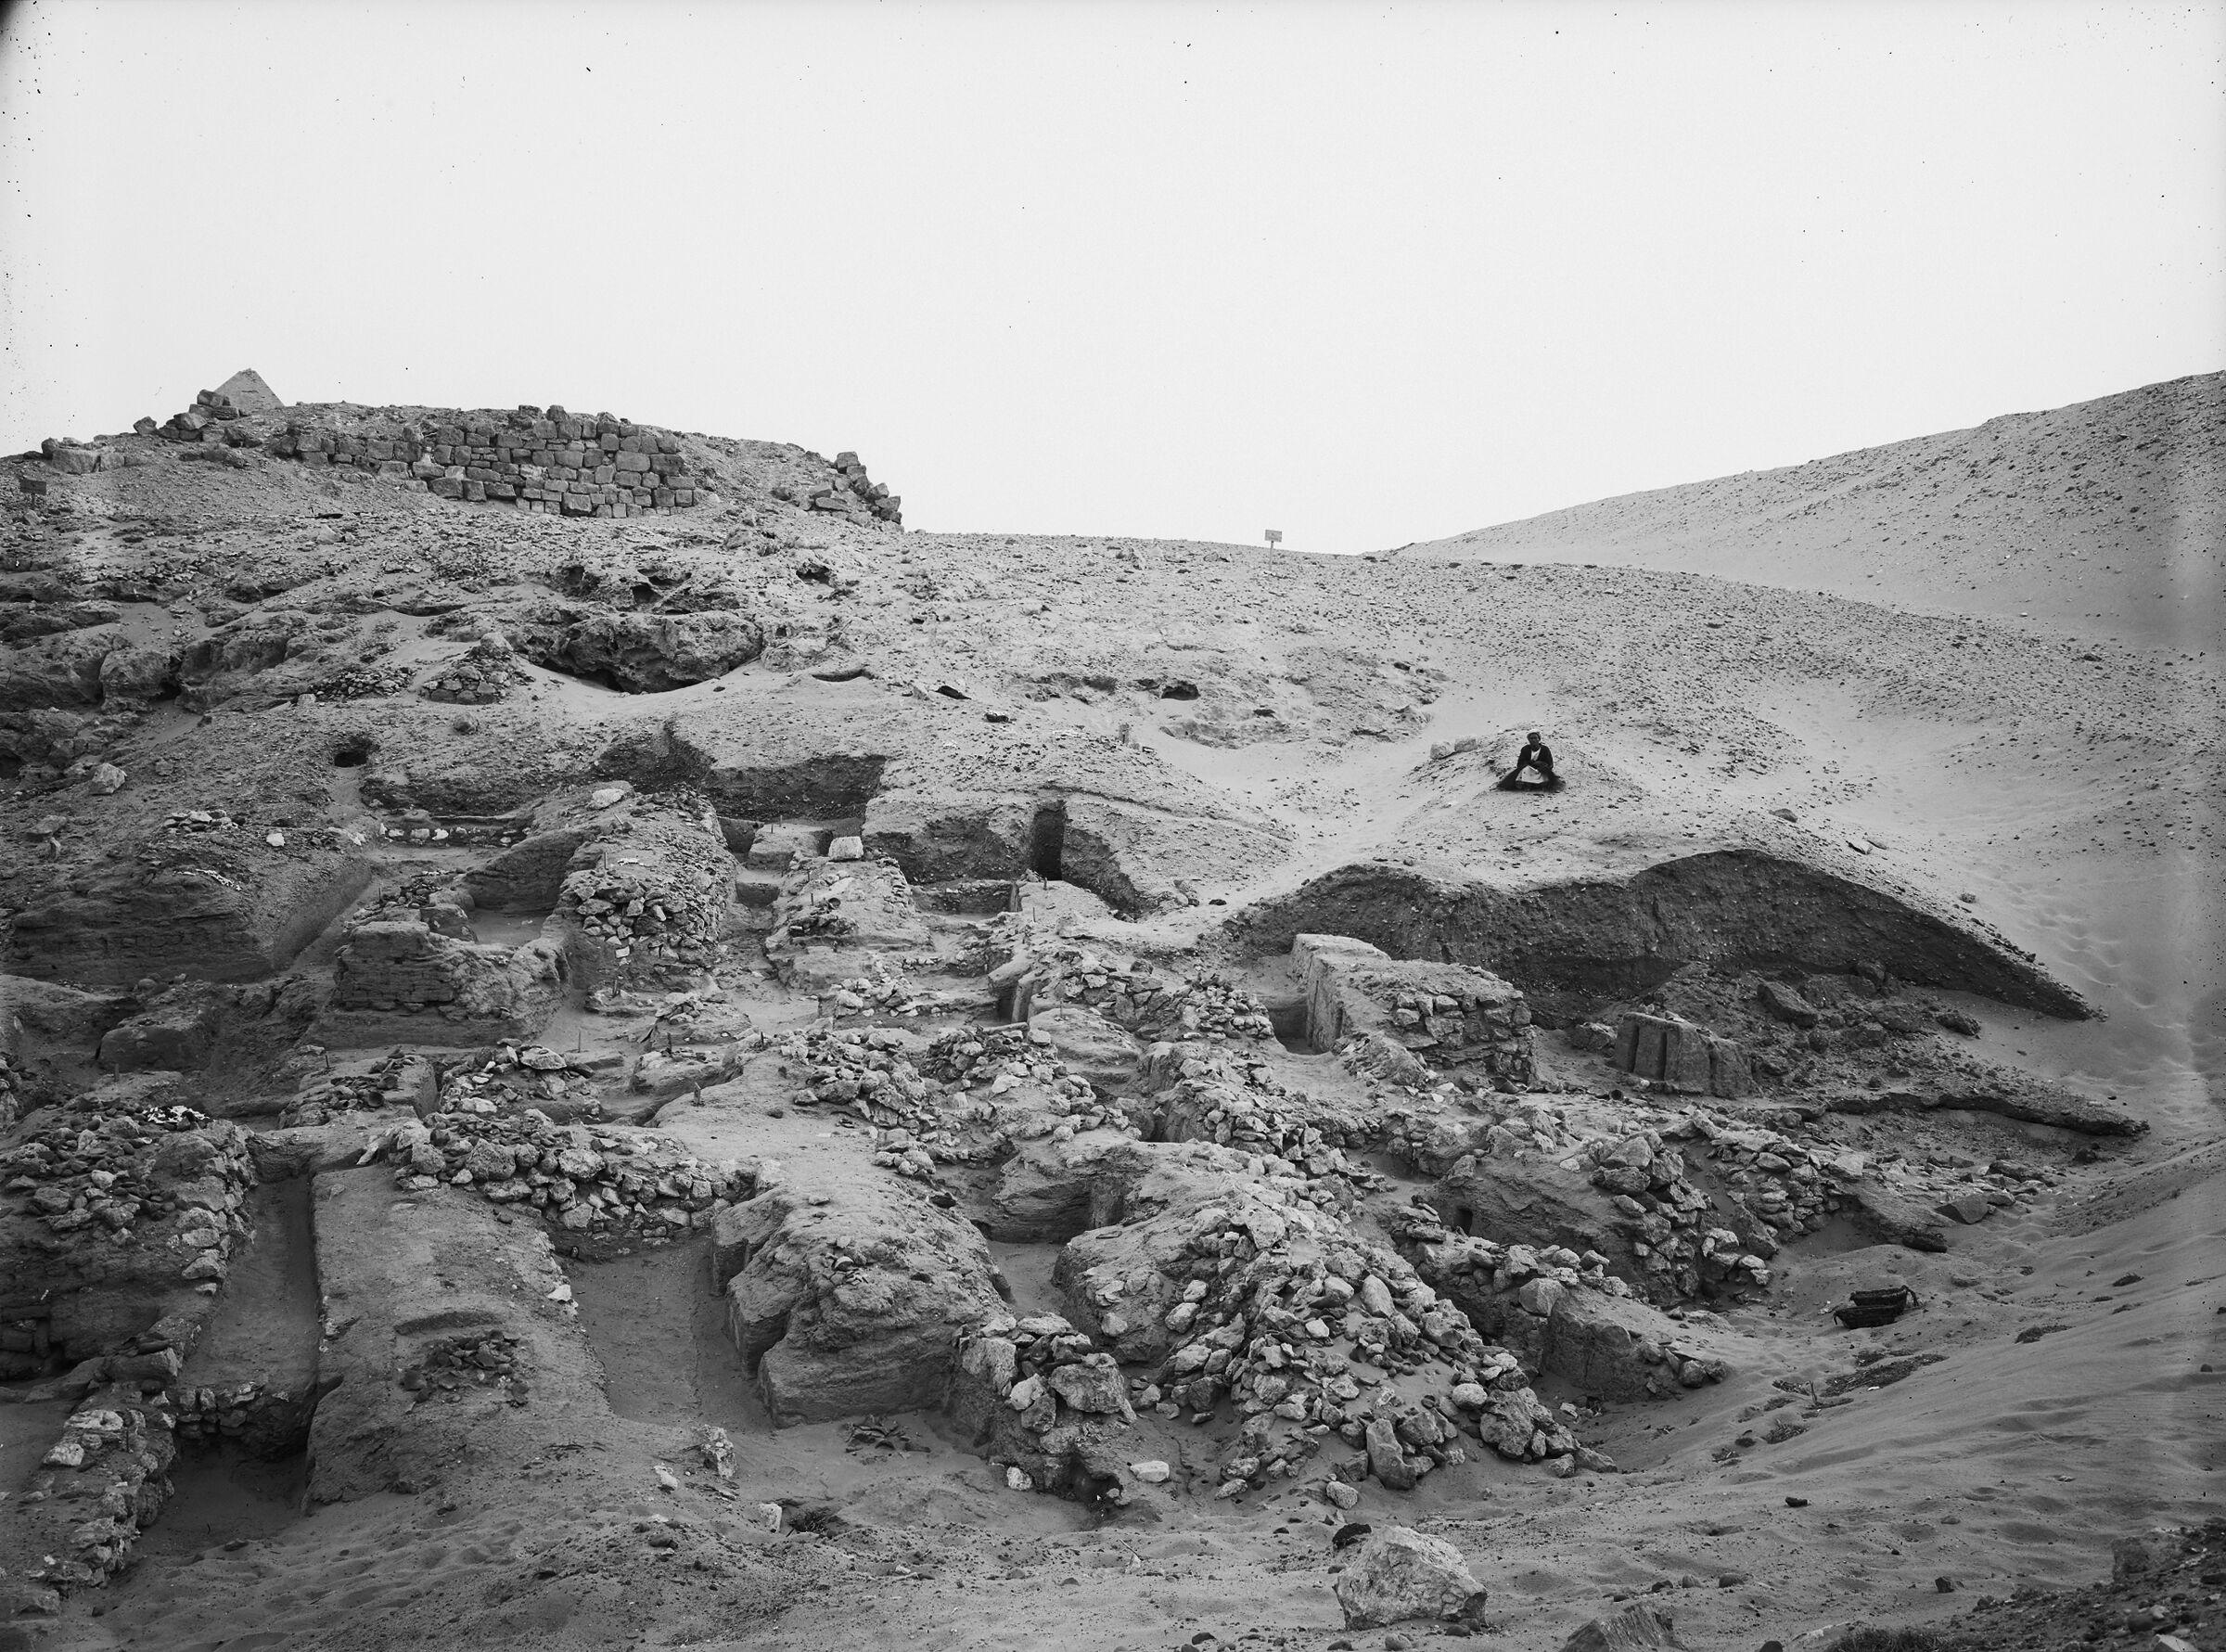 Wadi Cemetery (Reisner; north of W. Cem): Site: Giza; View: GW 16, GW 31, GW 32, GW 33, GW 34, GW 35, GW 36, GW 37, GW 38, GW 39, GW 40, GW 41, GW 42, GW 43, GW 44, GW 57, GW 58, GW 59, GW 60, GW 62, GW 63, GW 75